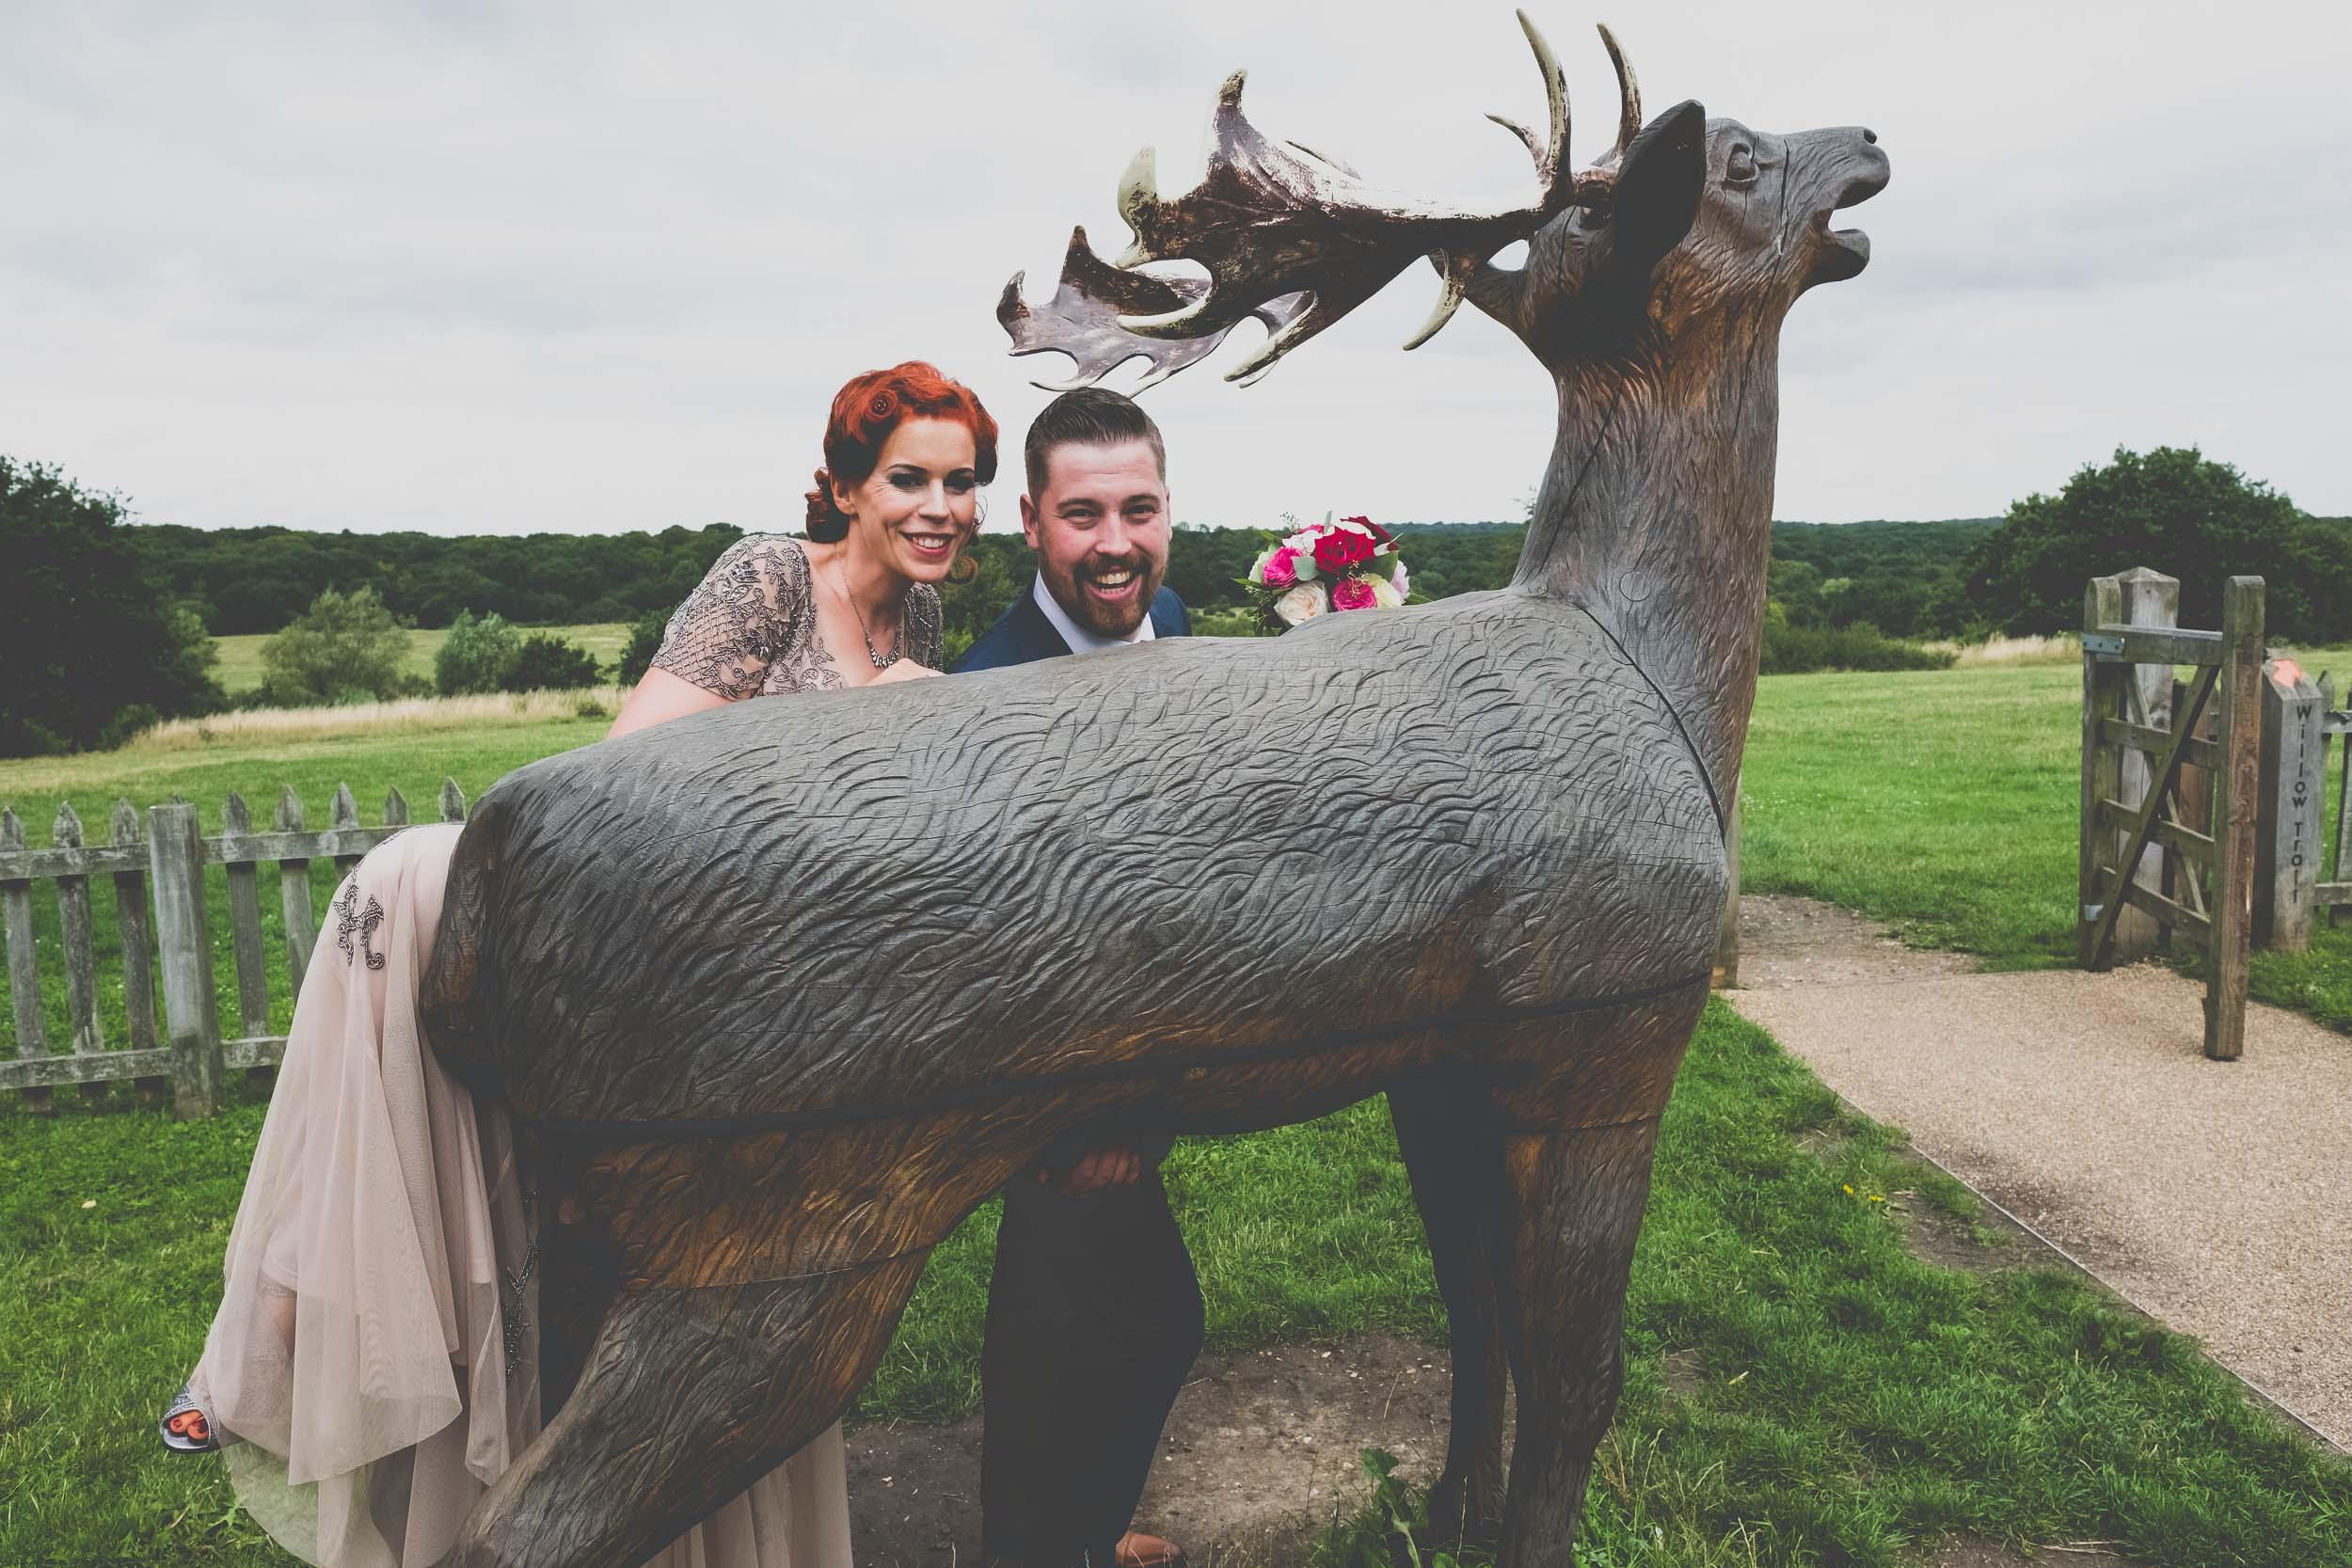 queen-elizabeths-hunting-lodge-epping-forest-wedding211.jpg